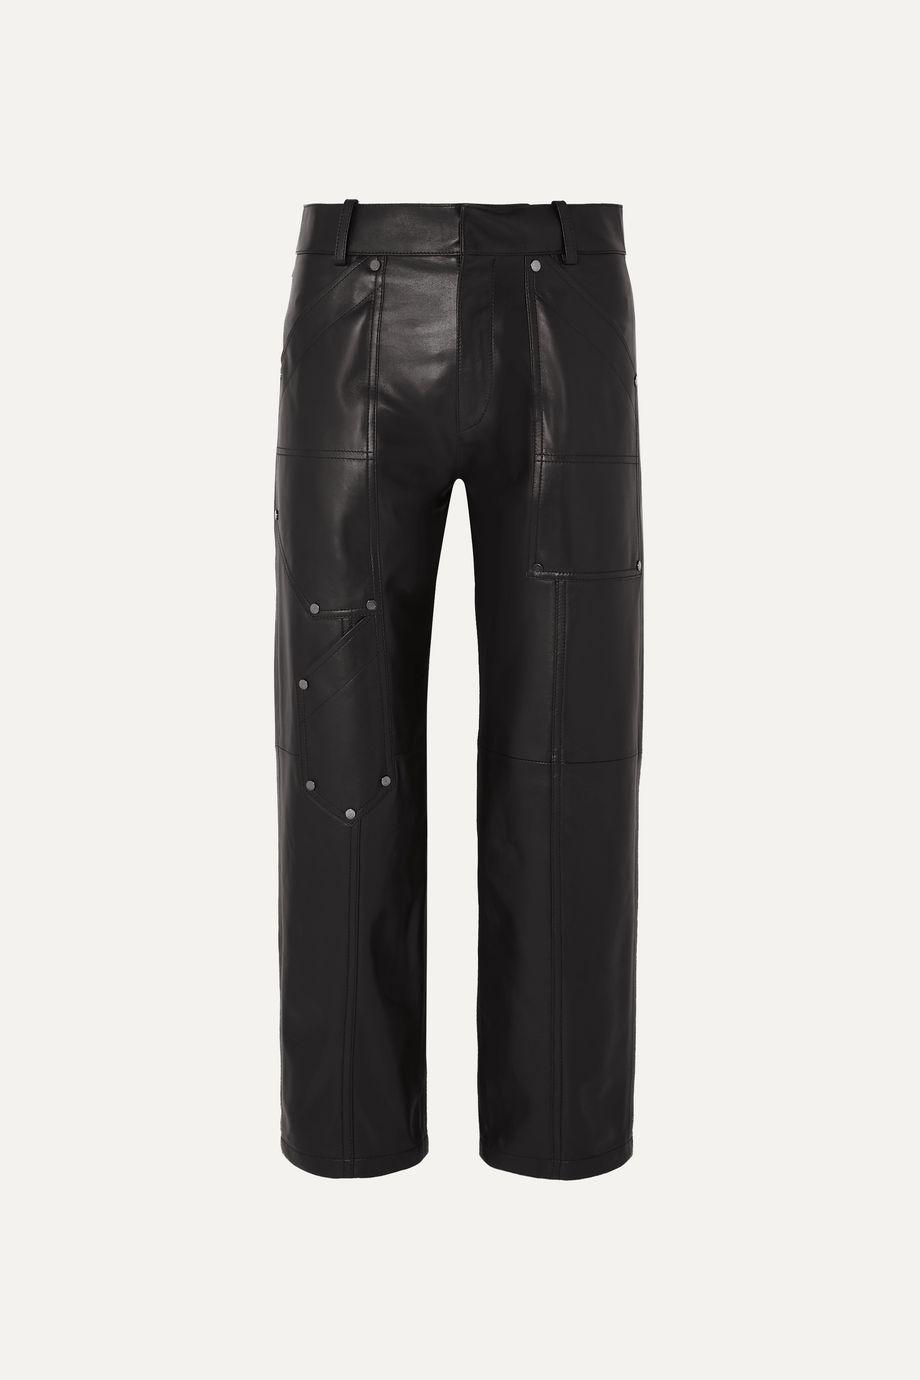 Chloé Studded leather straight-leg pants